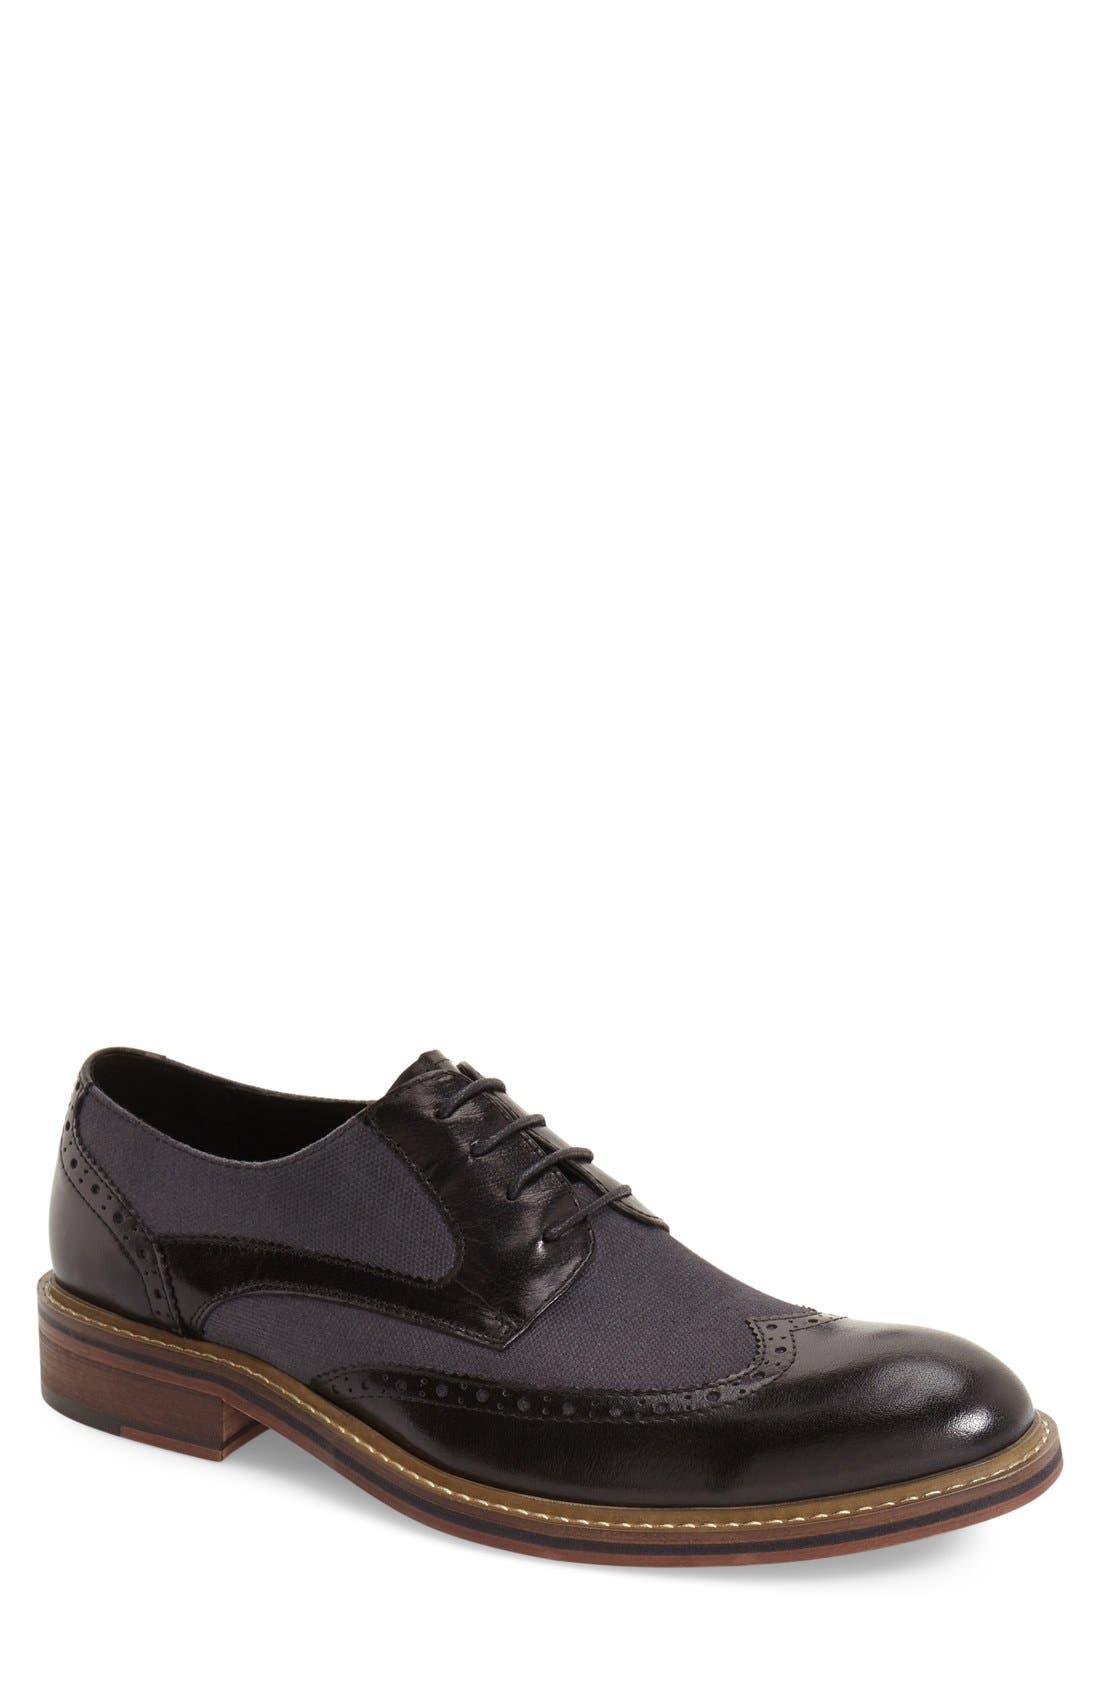 1930s Men's Clothing Mens Zanzara Money Spectator Shoe $137.90 AT vintagedancer.com